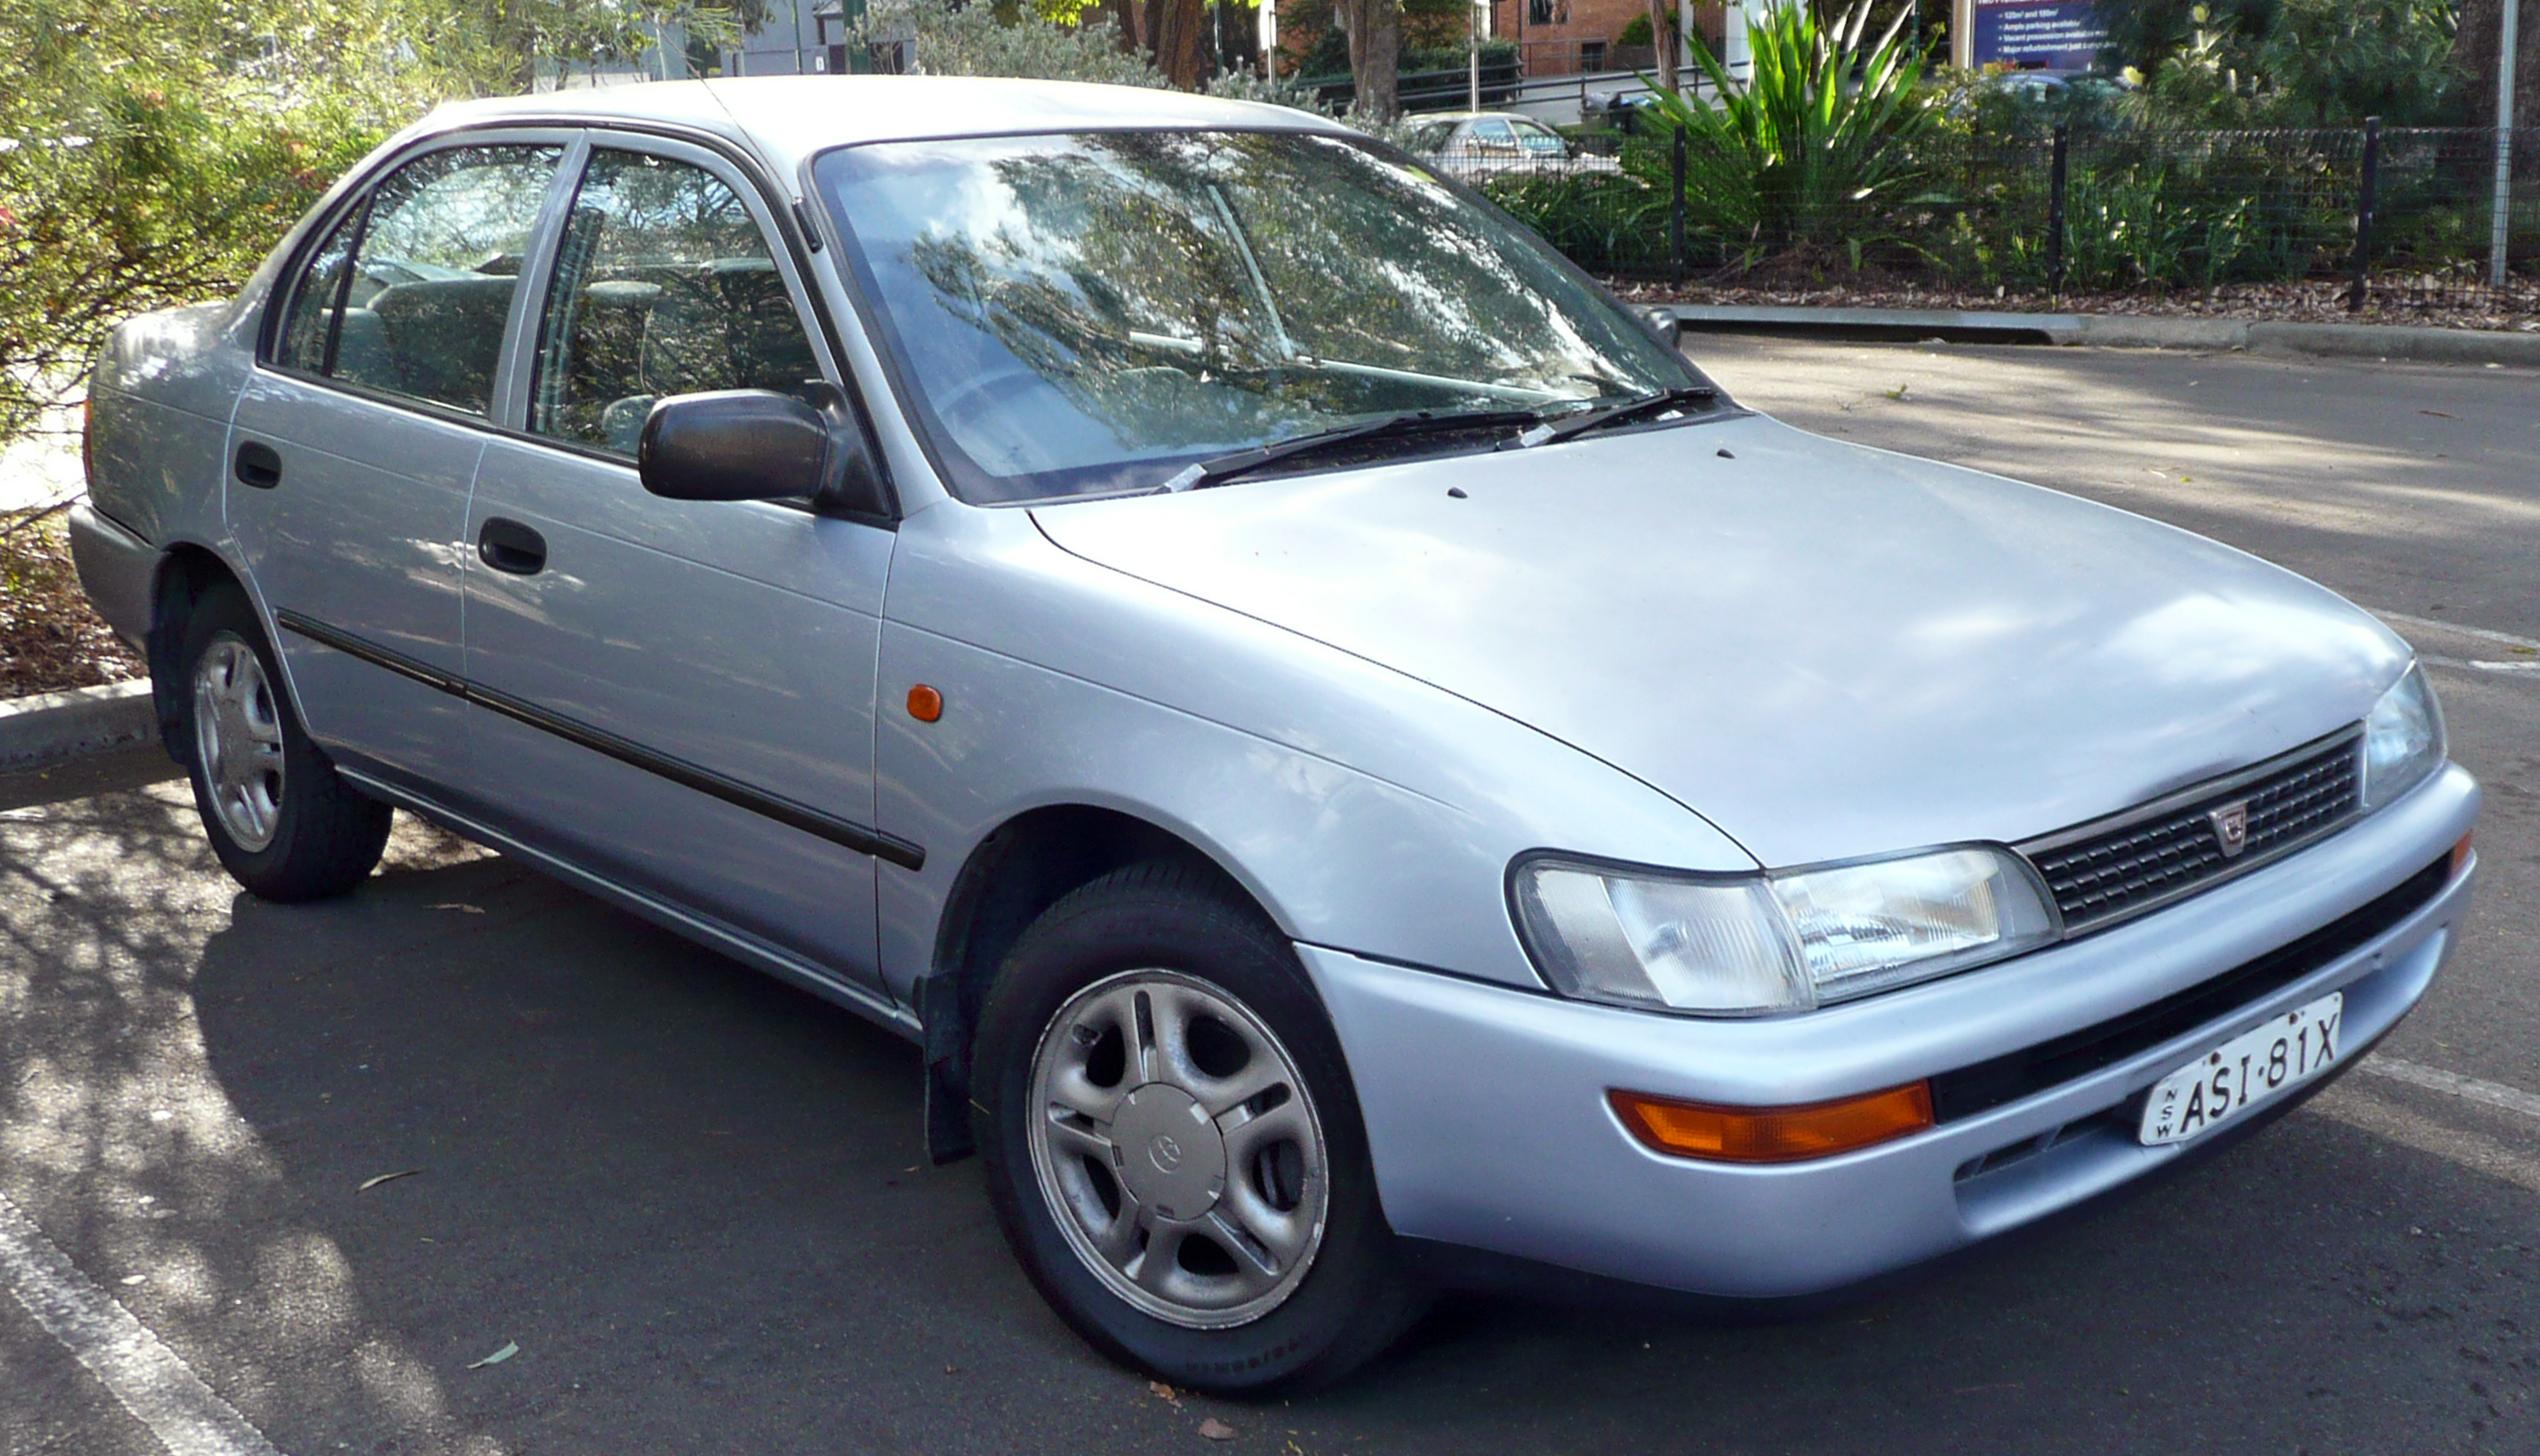 File:1996-1999 Toyota Corolla (AE101R) CSi sedan 02.jpg - Wikimedia ...